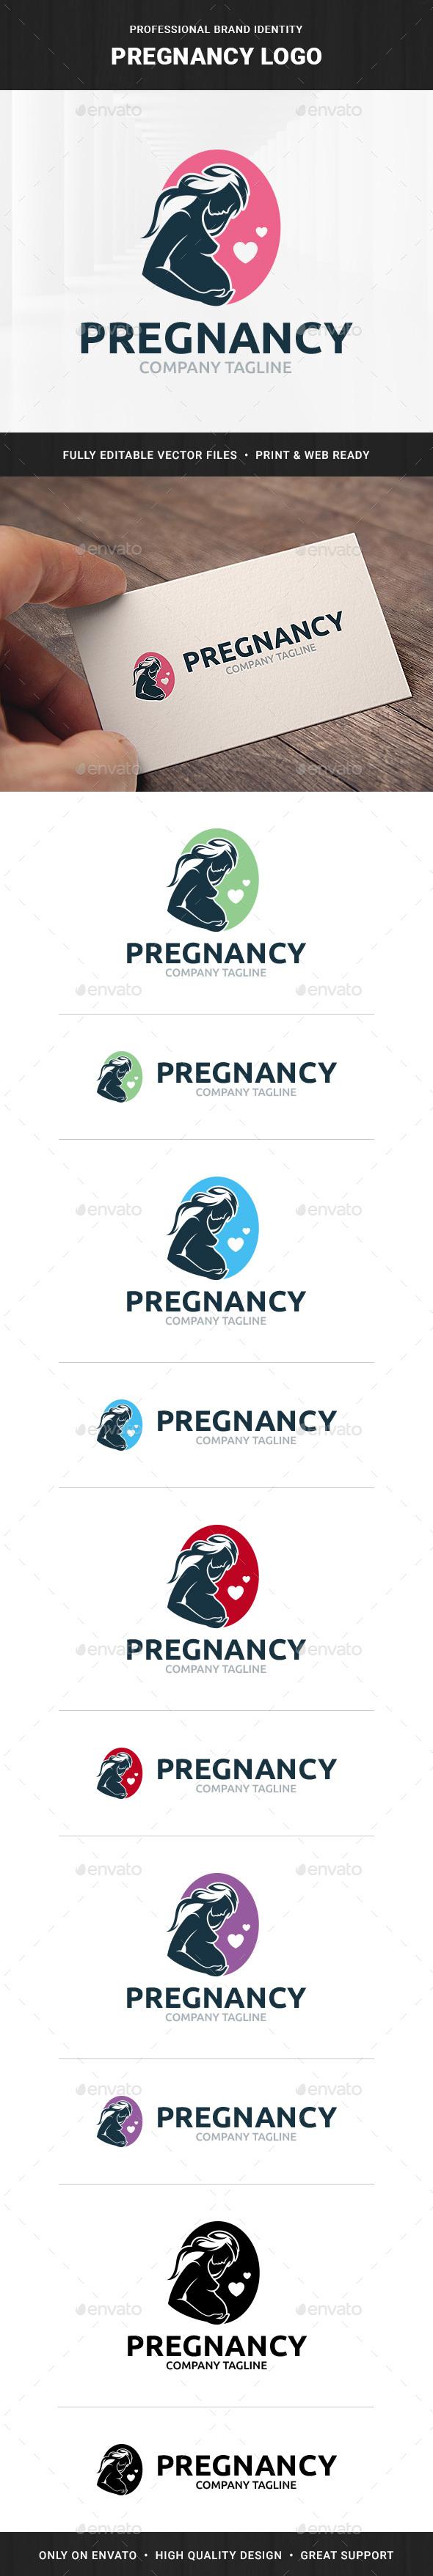 Pregnancy Logo Template